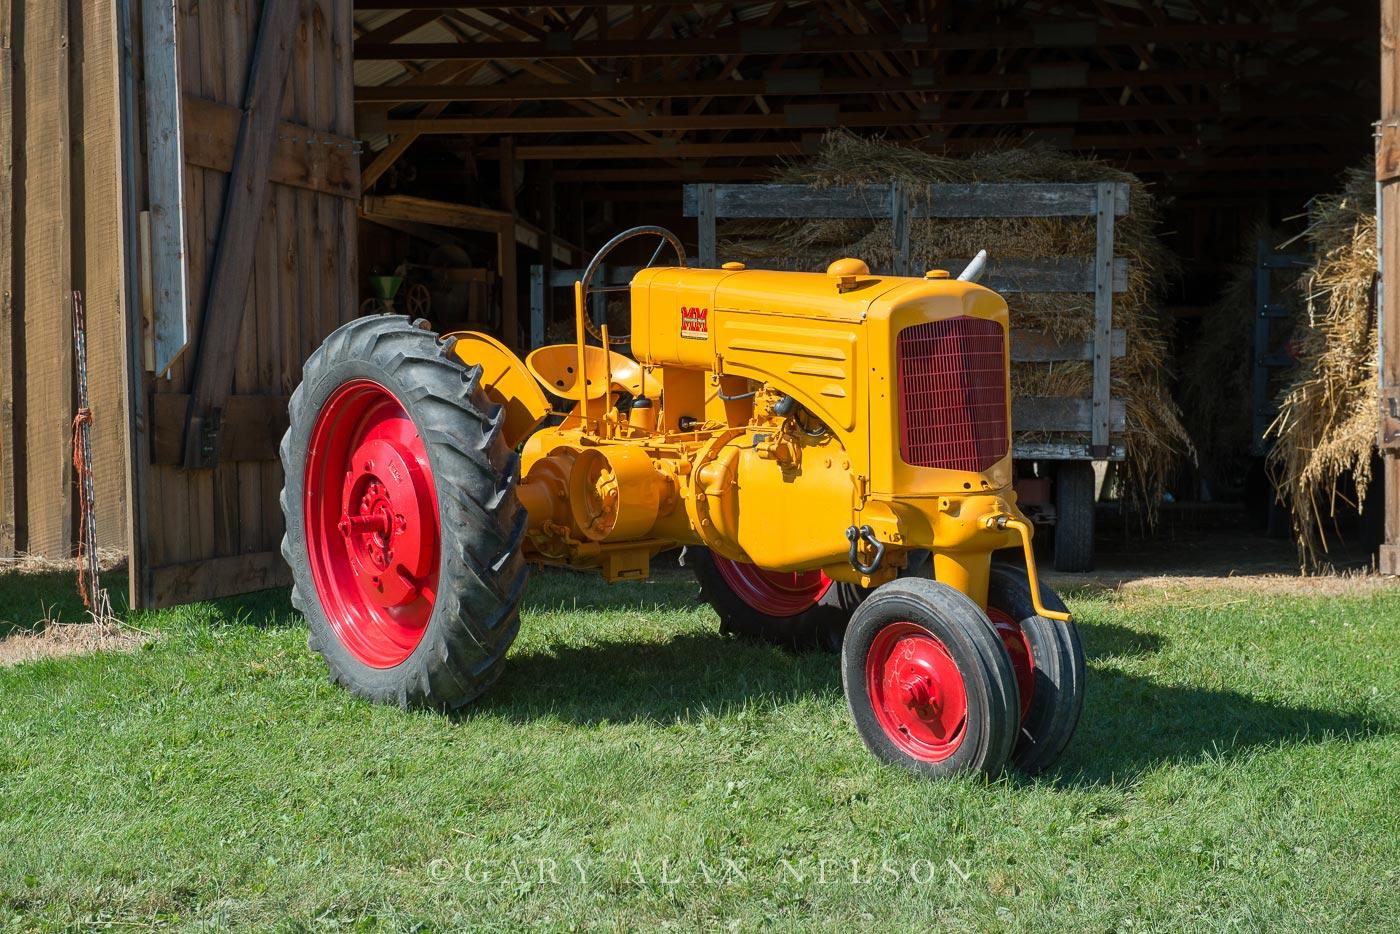 Minneapolis Moline, antique tractor, photo